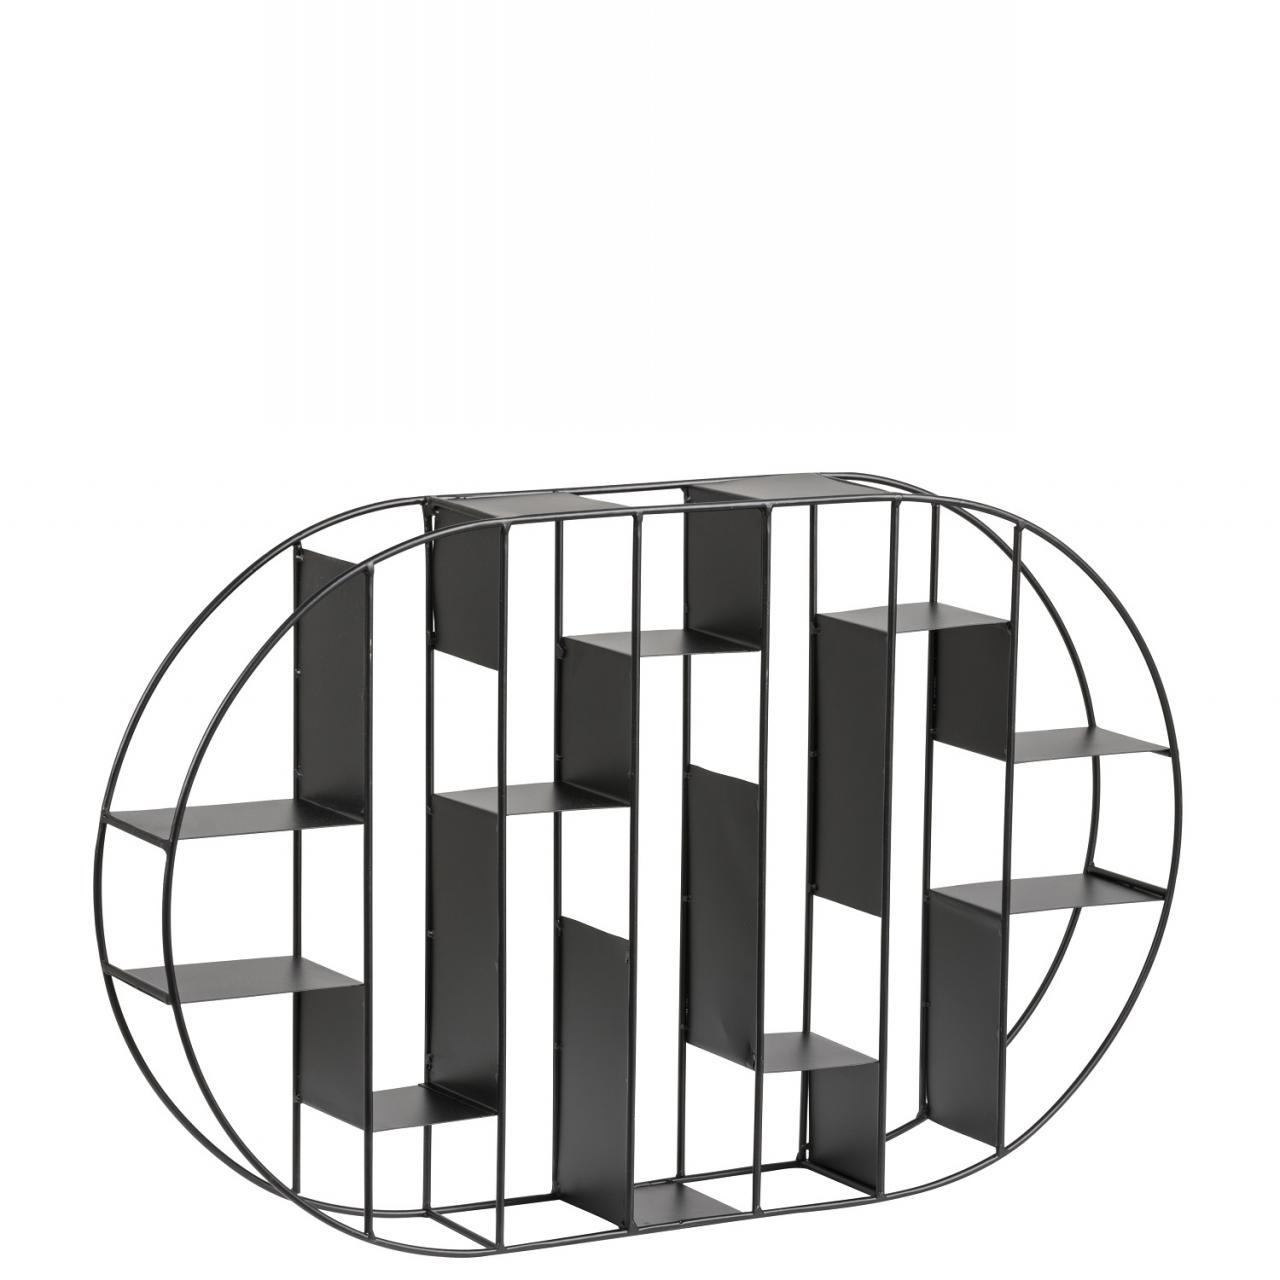 Garnet Regal Böden Metall pulverbeschichtet, schwarz L:64 B:9 H:40 cm